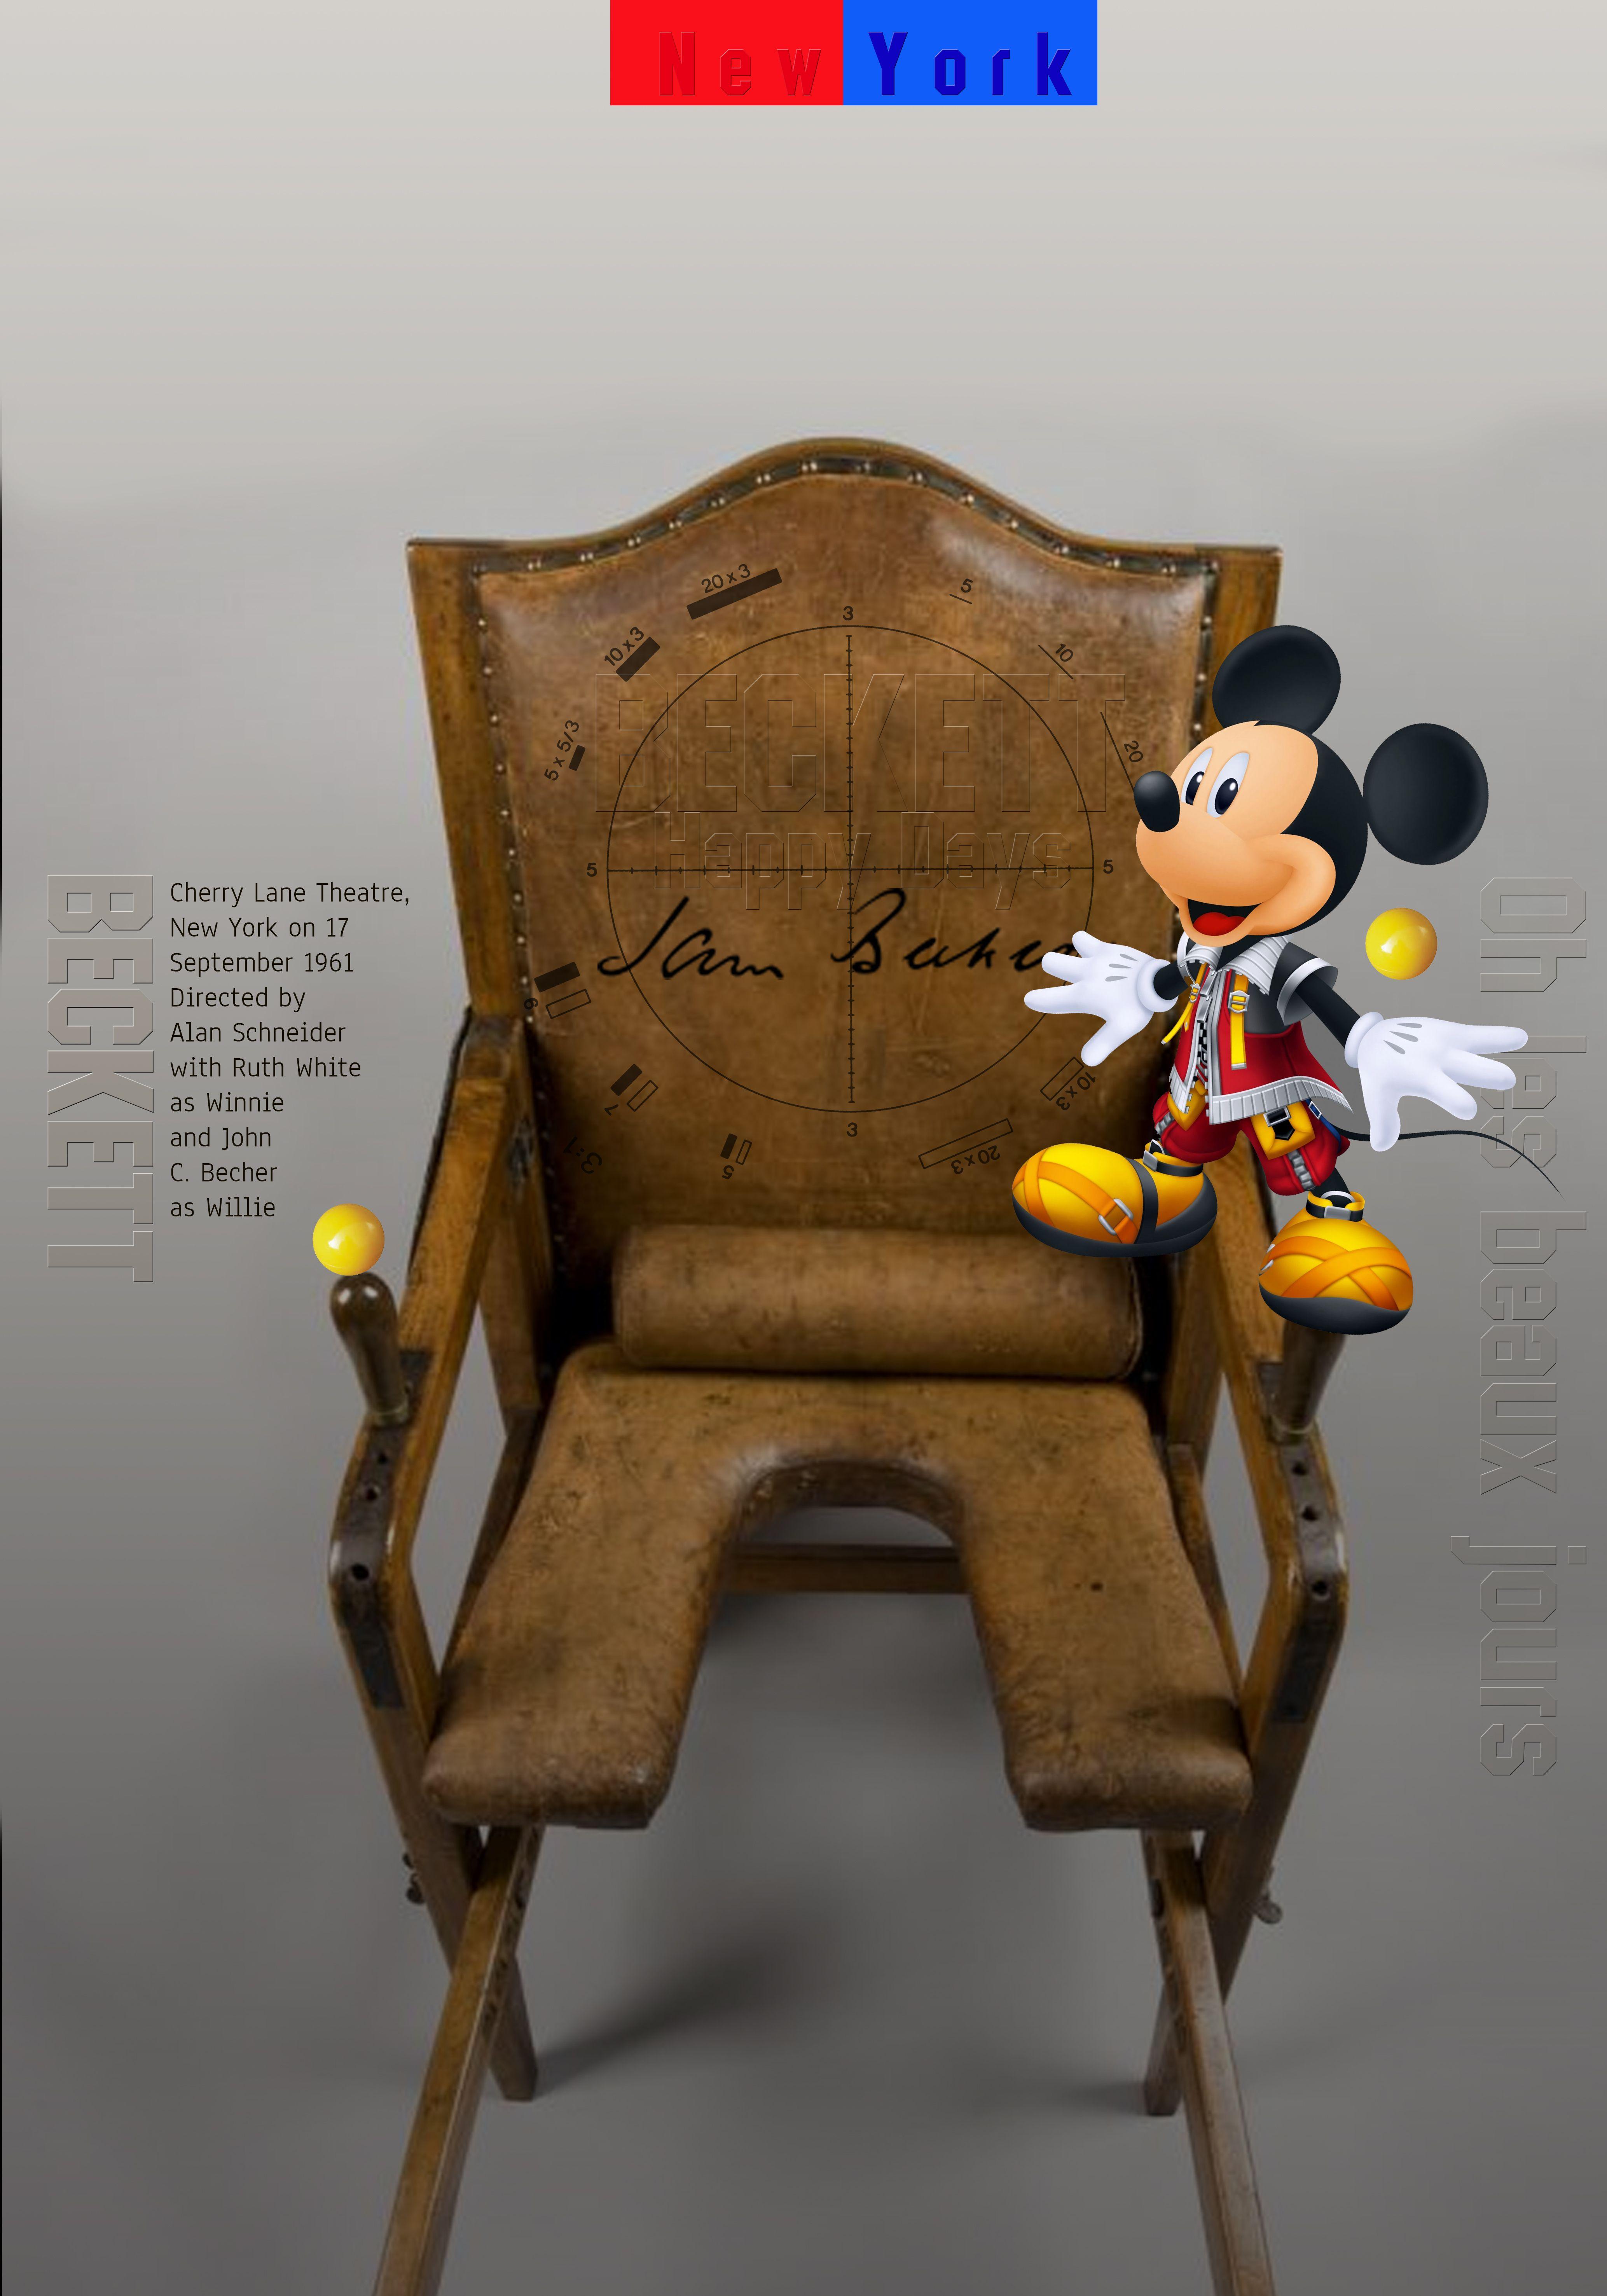 SAMUEL BECKETT Vintage medical, Chair, Medical curiosities